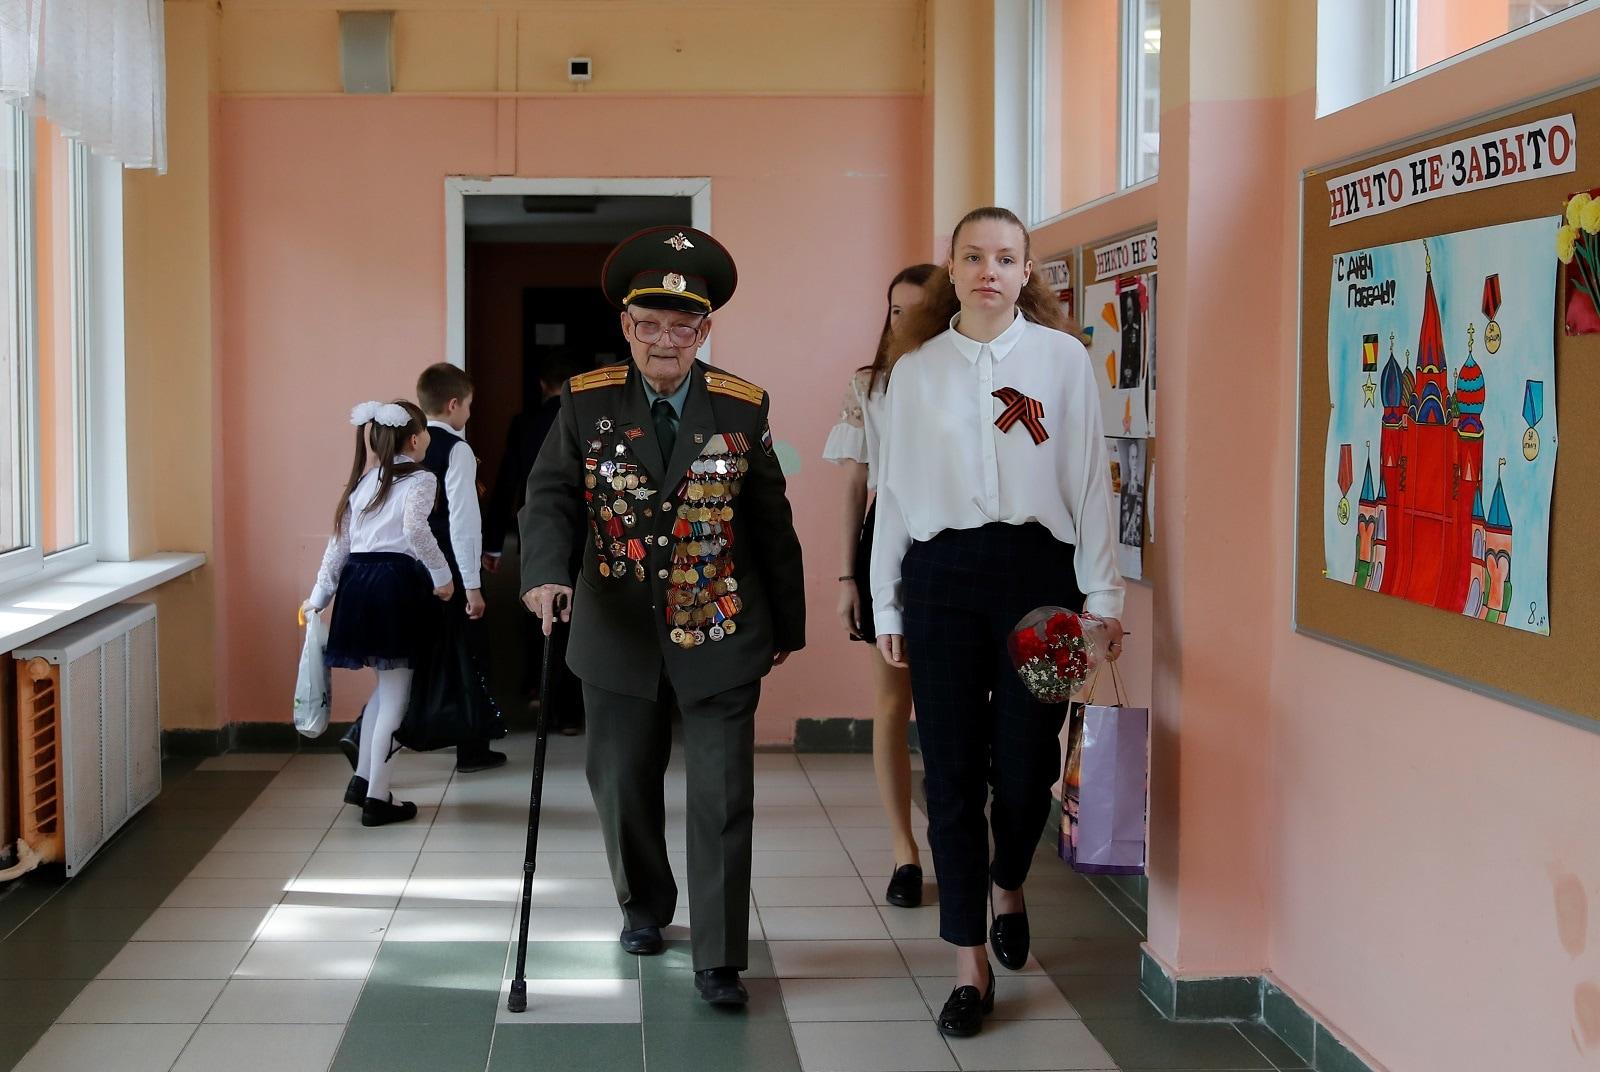 Veteran Nikolay Bagayev, 100, walks in a school in Korolyov, north of Moscow, Russia May 8, 2019. REUTERS/Maxim Shemetov